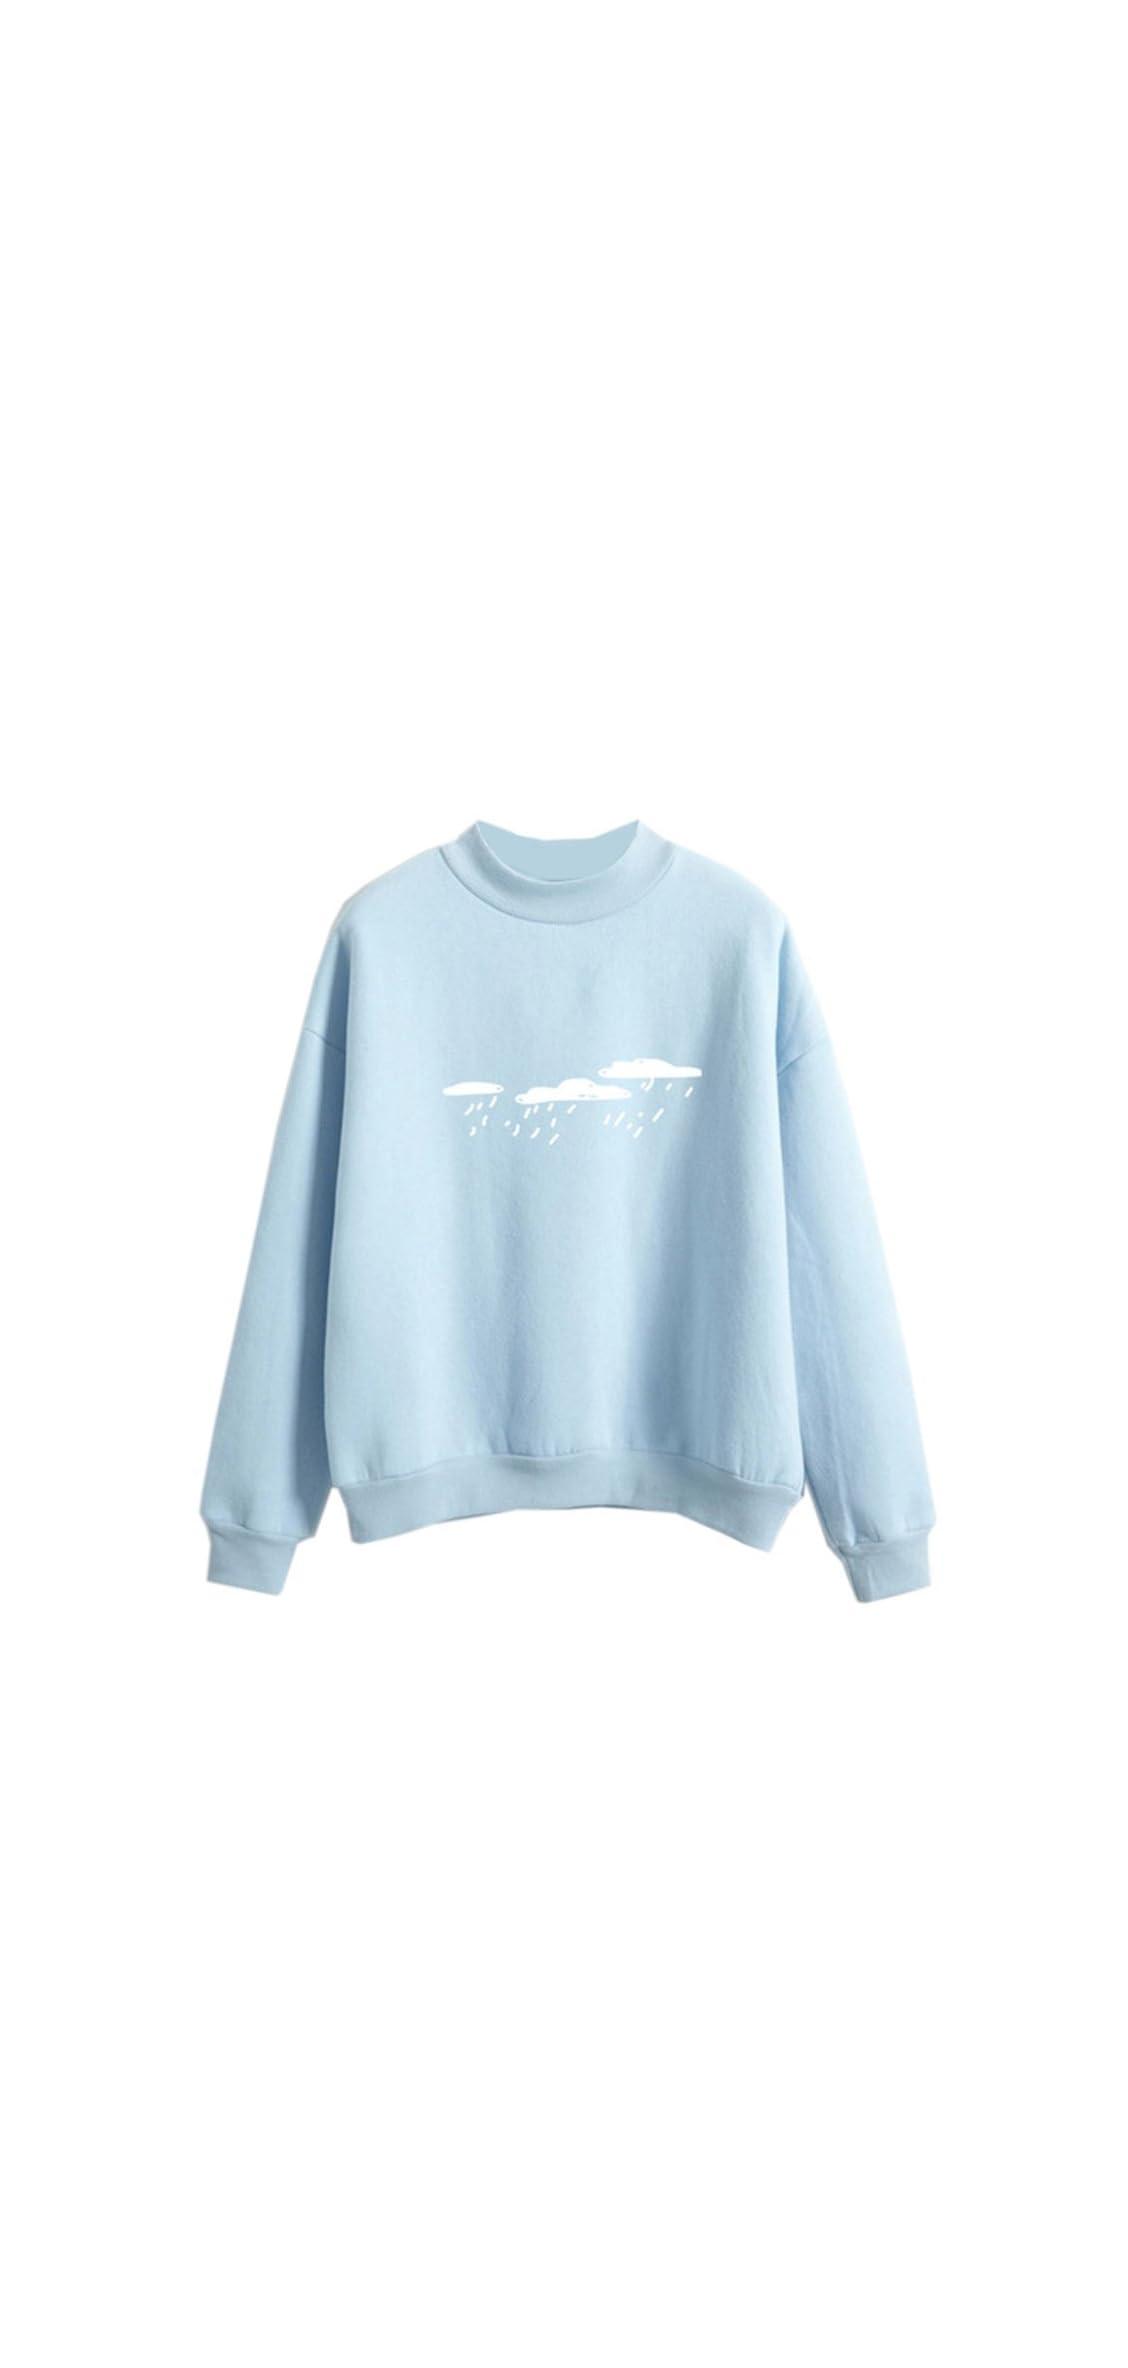 Harajuku Sweater Cool Hoodies For Teens Cloud Cute